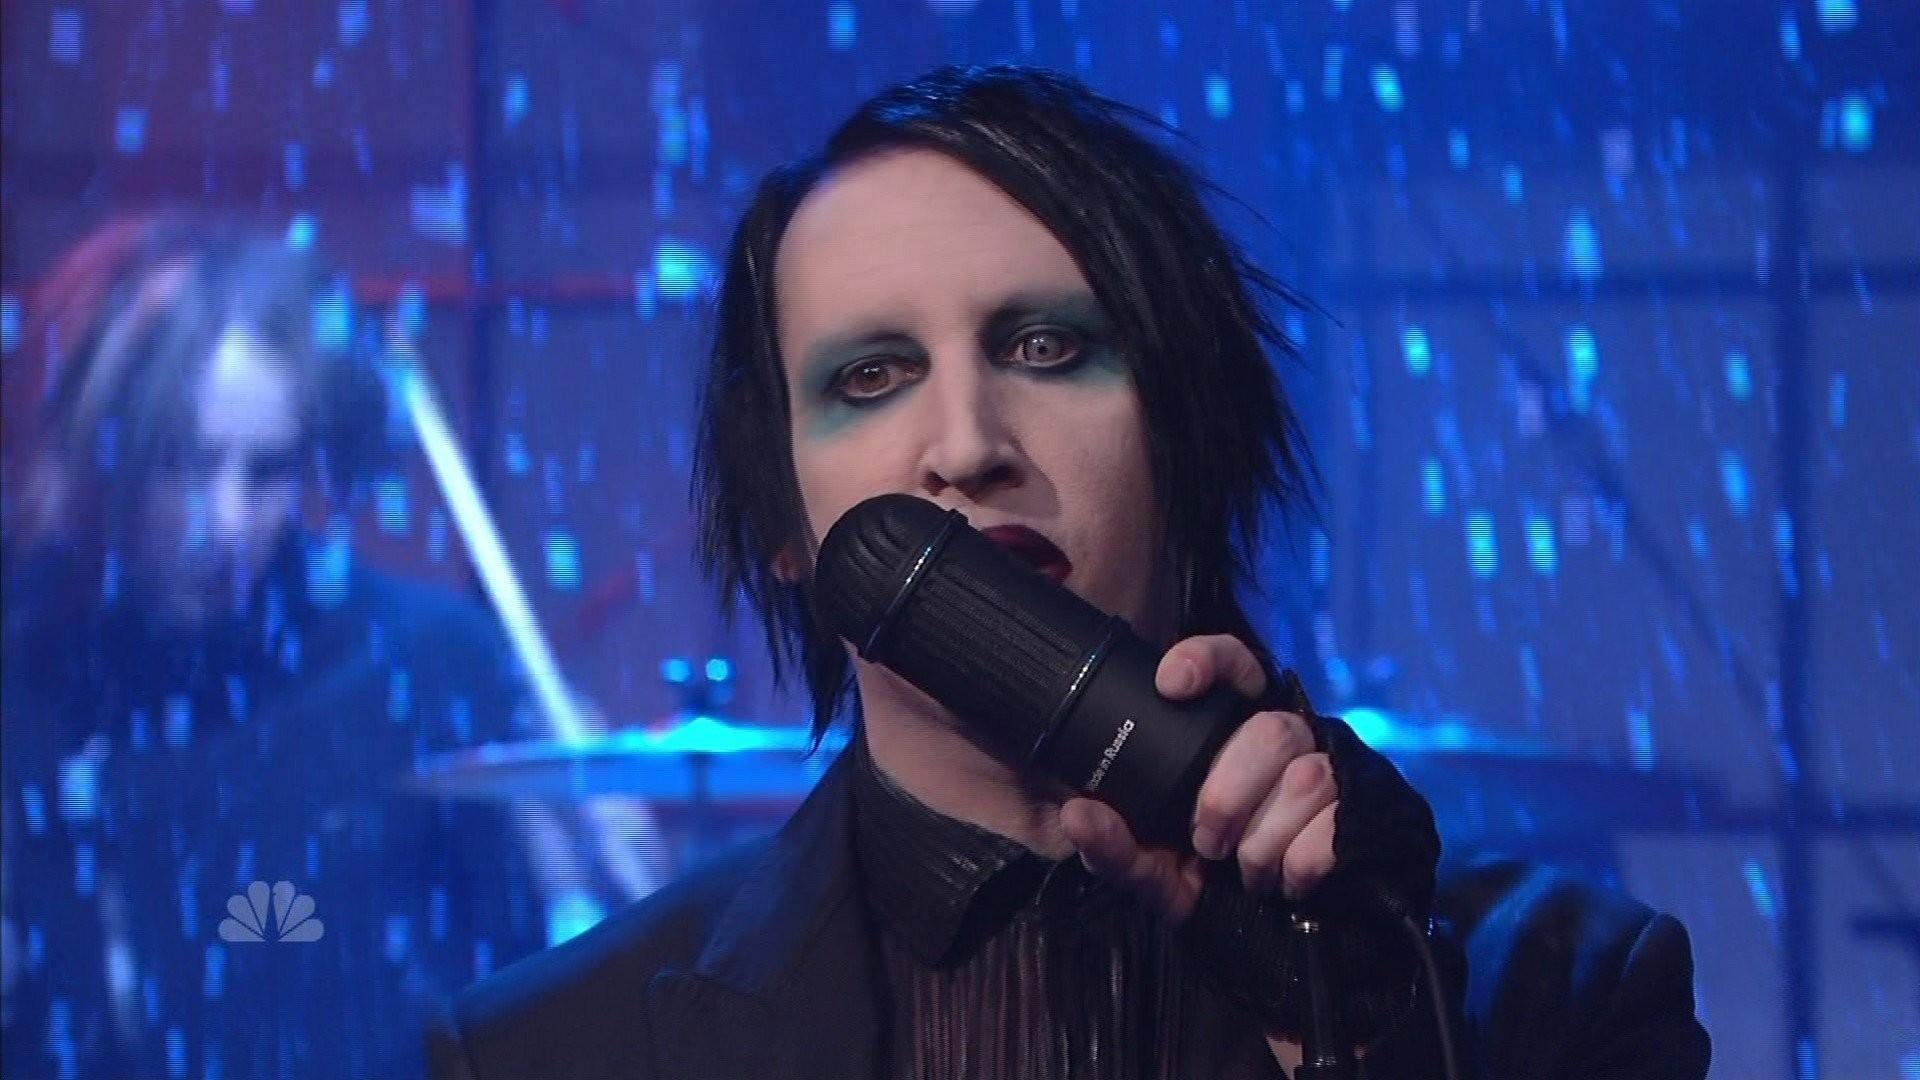 Halloween Marilyn Manson – WallDevil